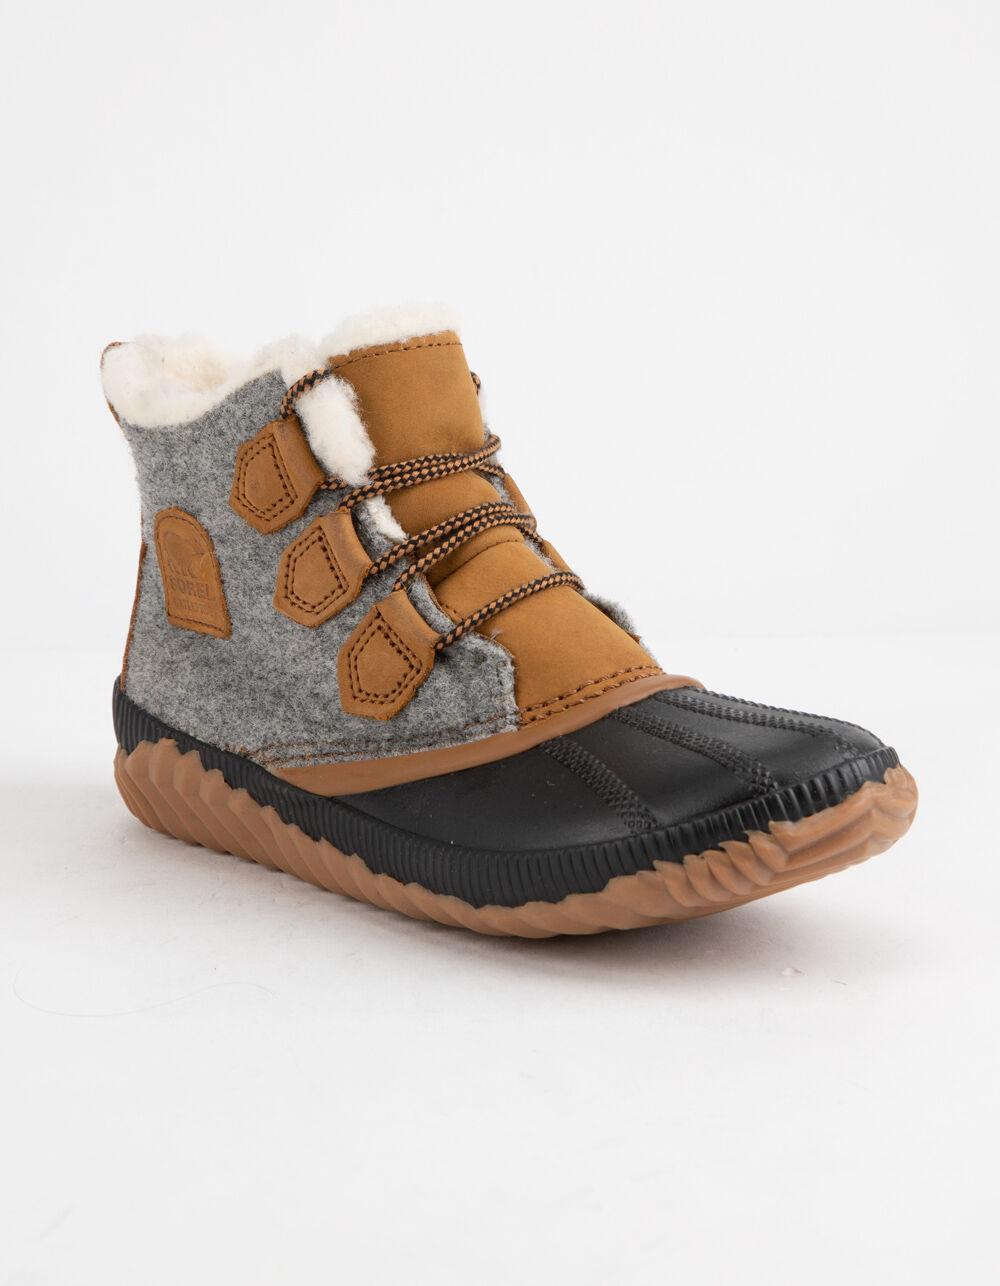 SOREL Out 'N About Plus Quarry Boots